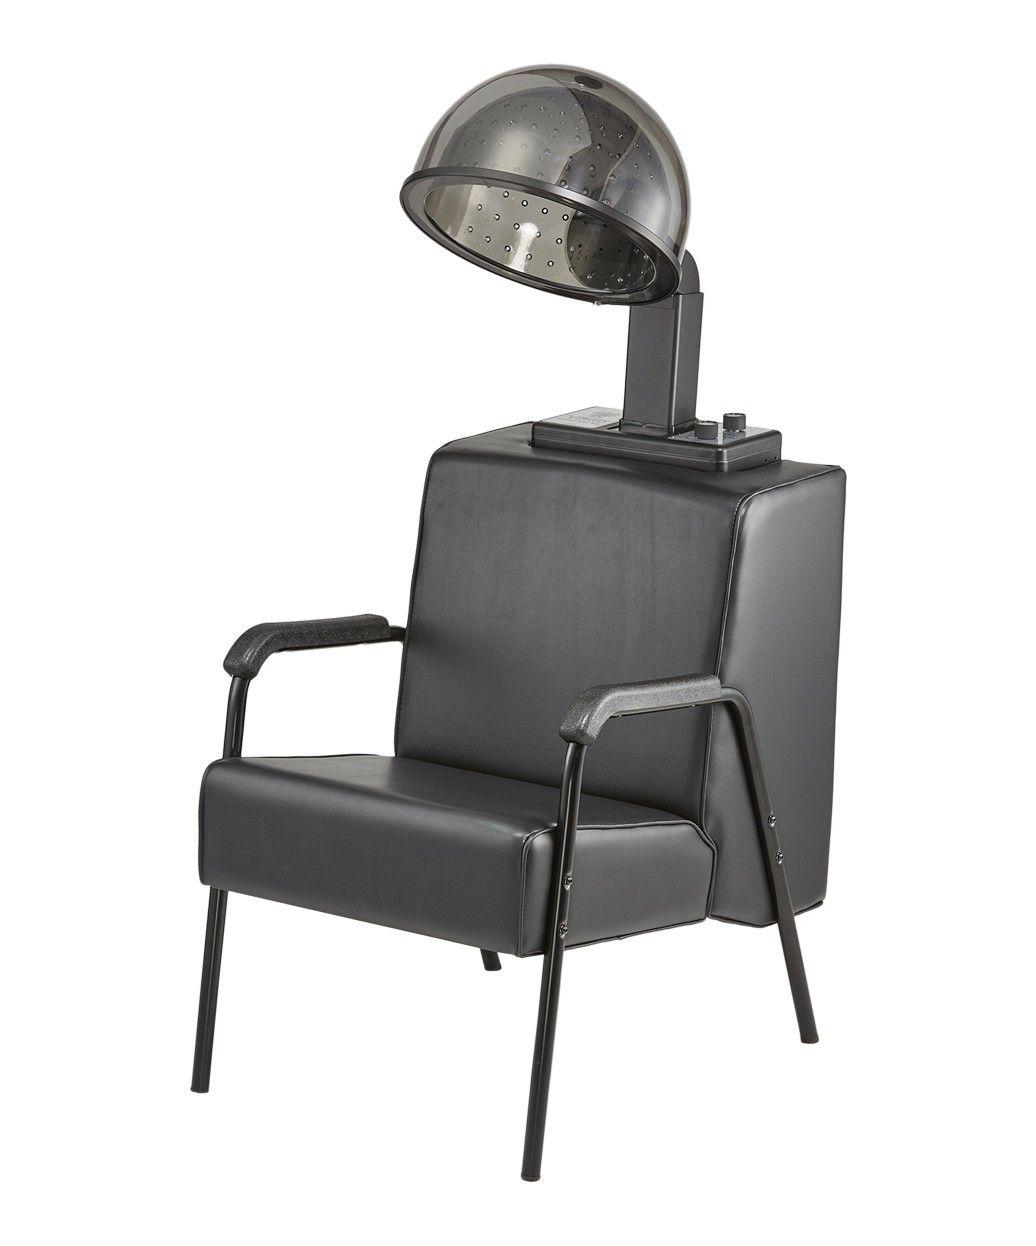 Pibbs 1098 Dryer Chair Chair, Vinyl colors, Living room